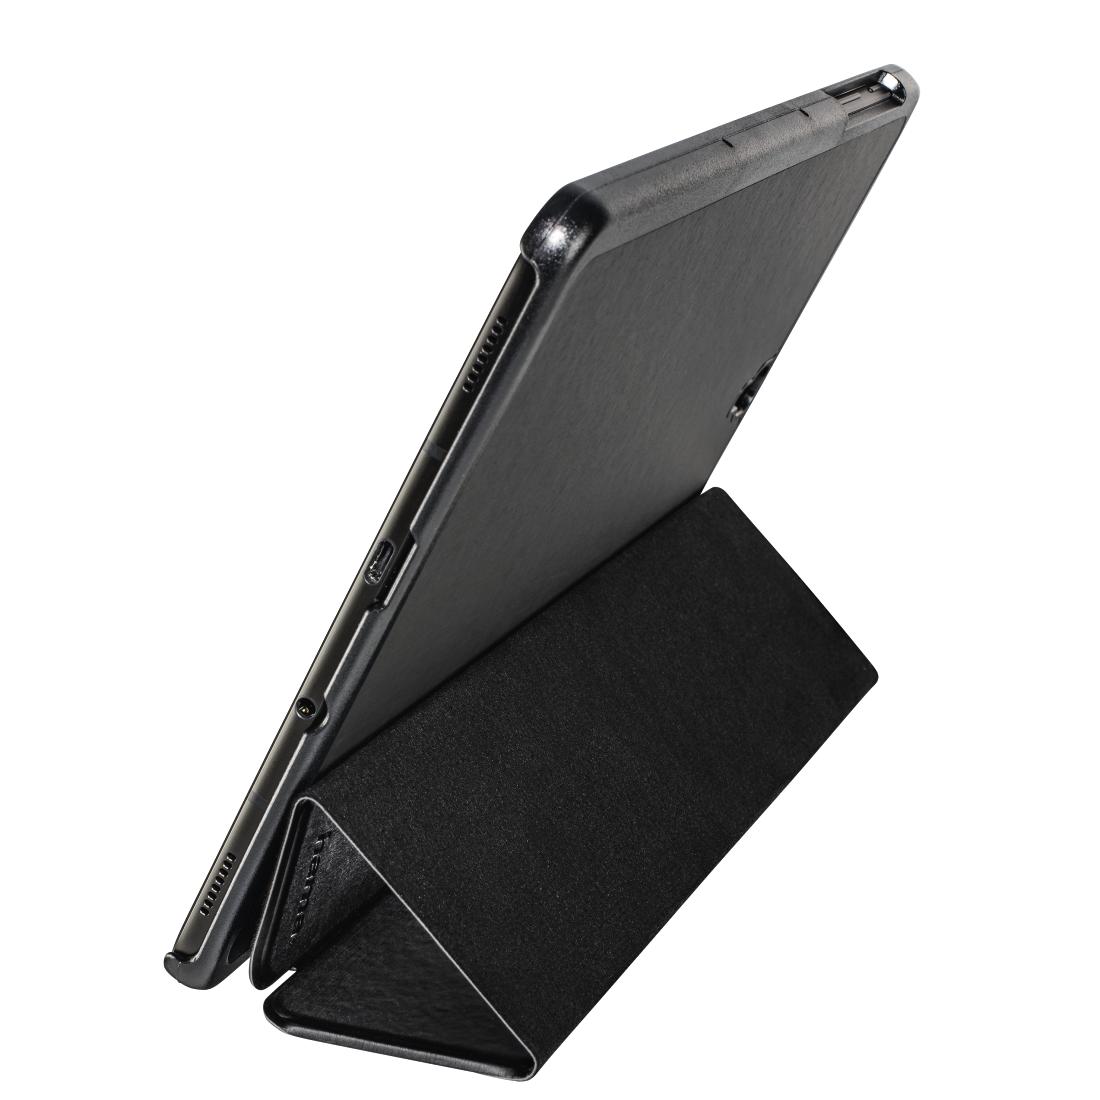 00173522 hama tui pour tablette fold pr samsung galaxy. Black Bedroom Furniture Sets. Home Design Ideas